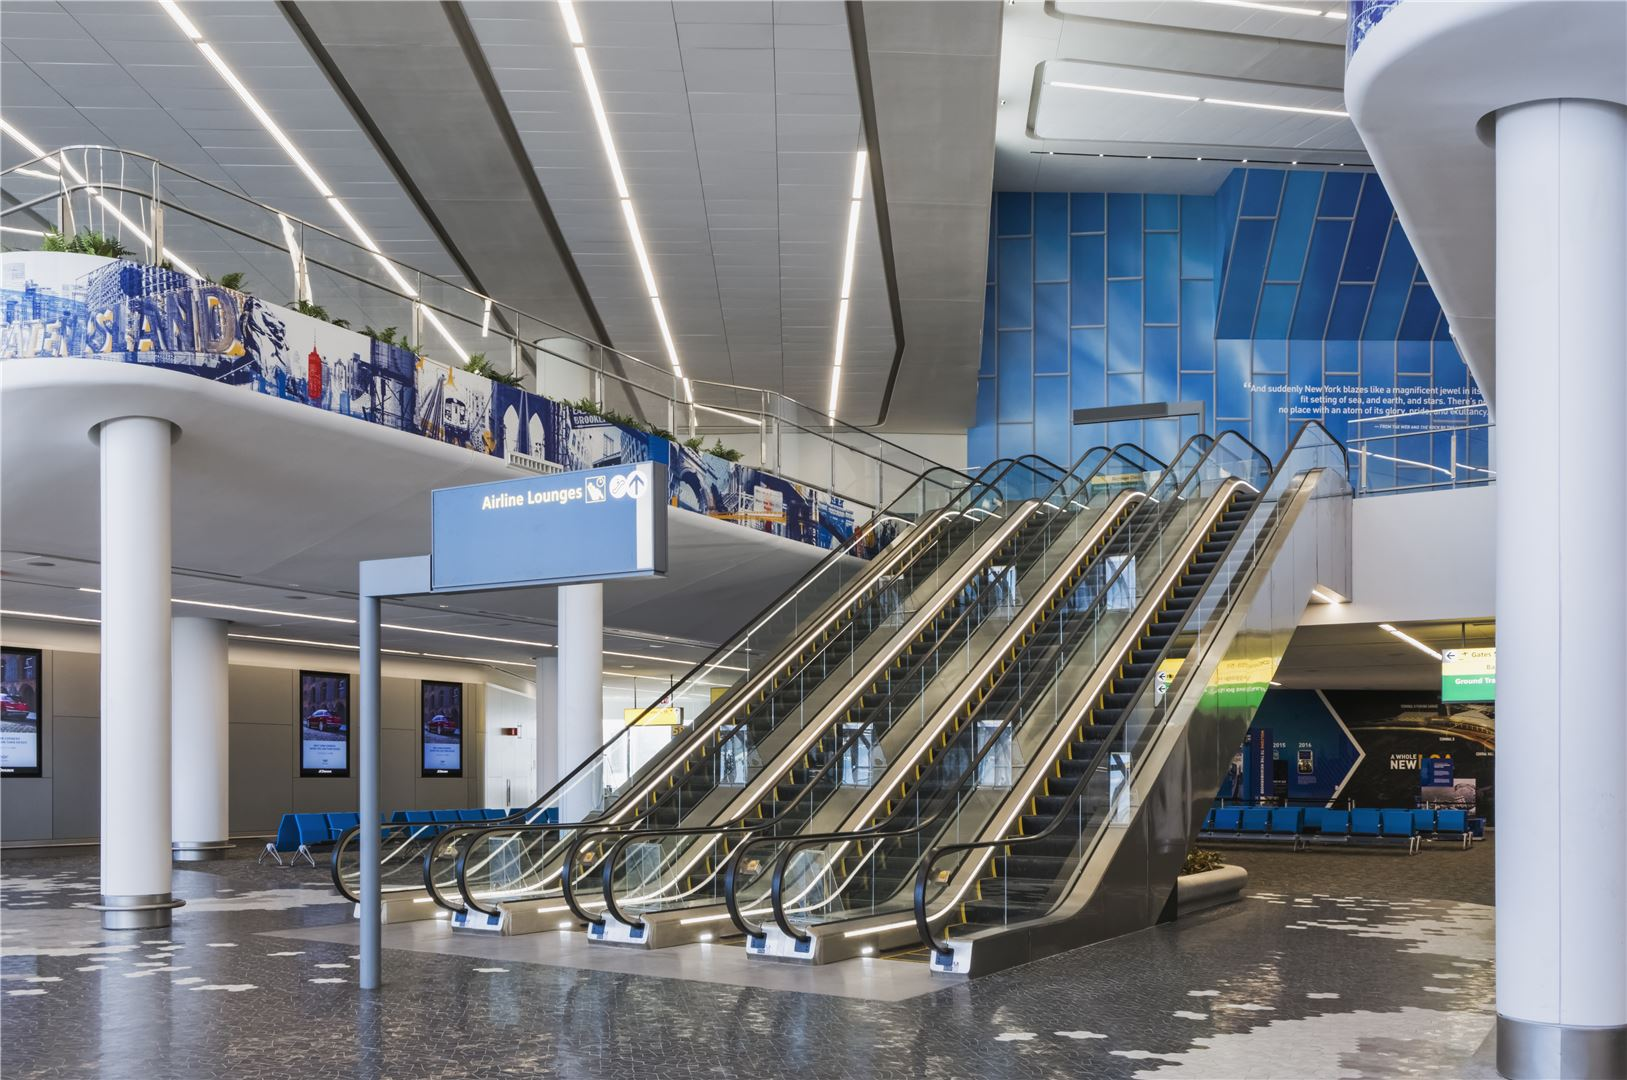 The new LaGuardia AIrport